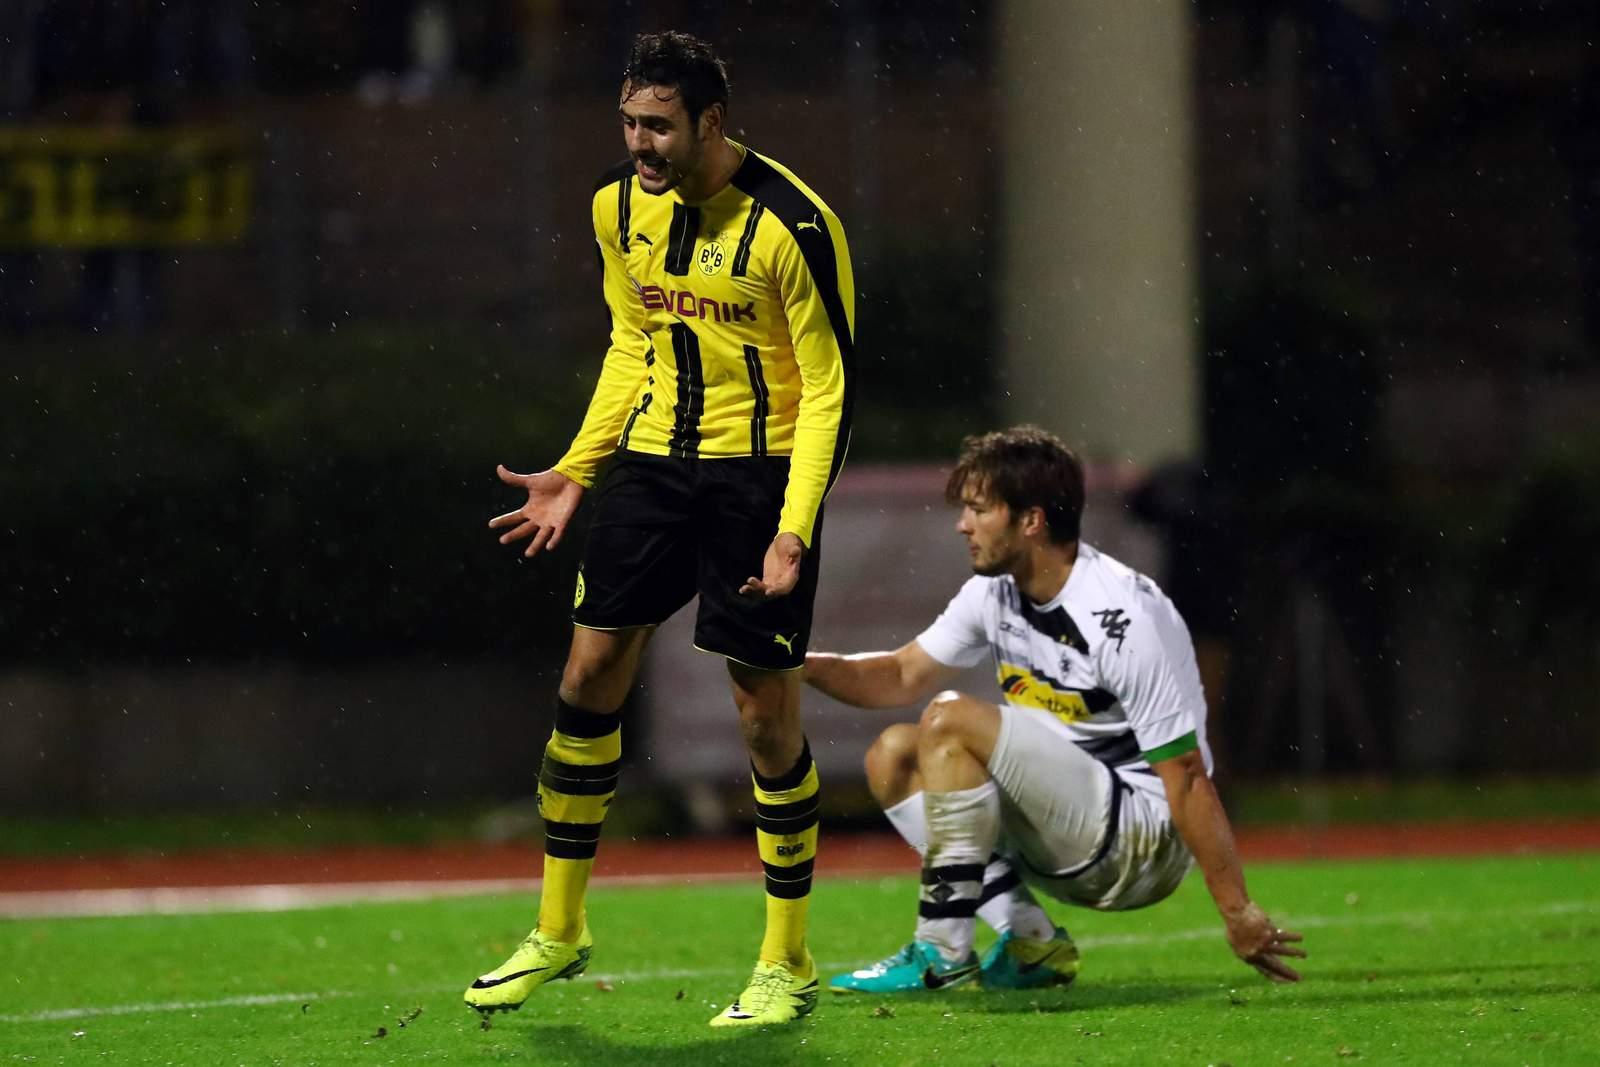 Hamadi Al Hhaddioui von Borussia Dortmund U23